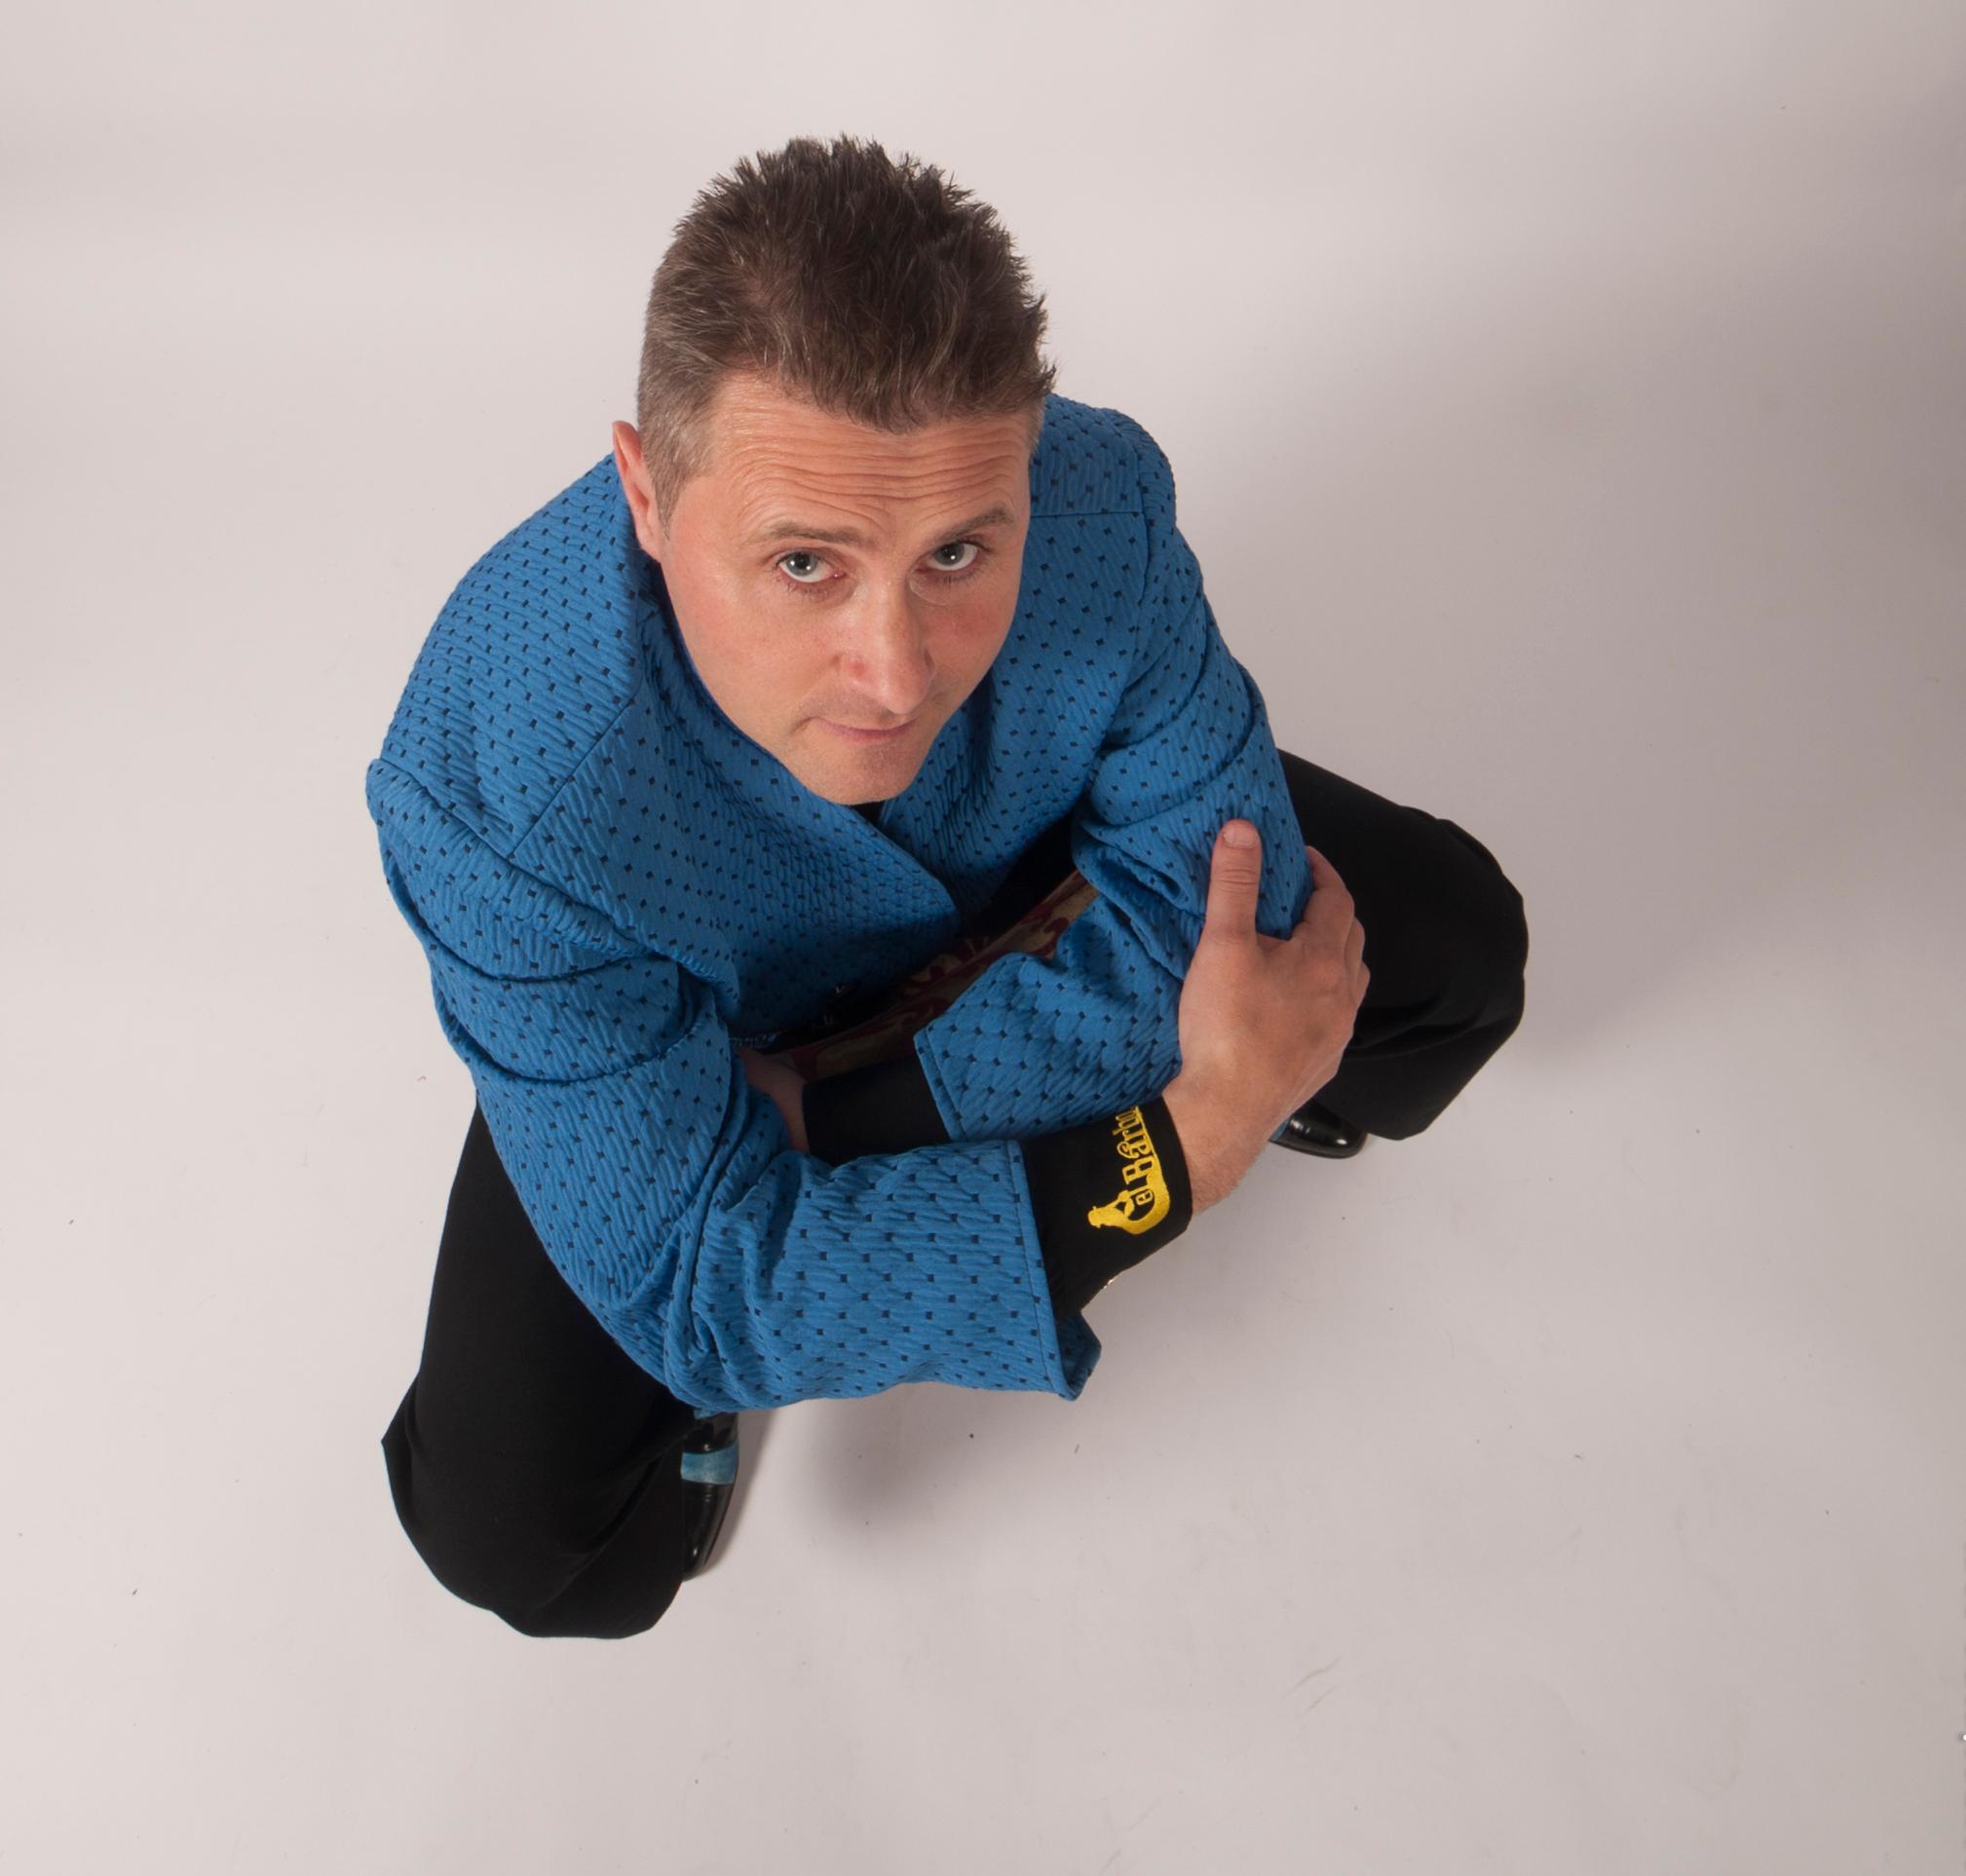 Identitaire costume bleu